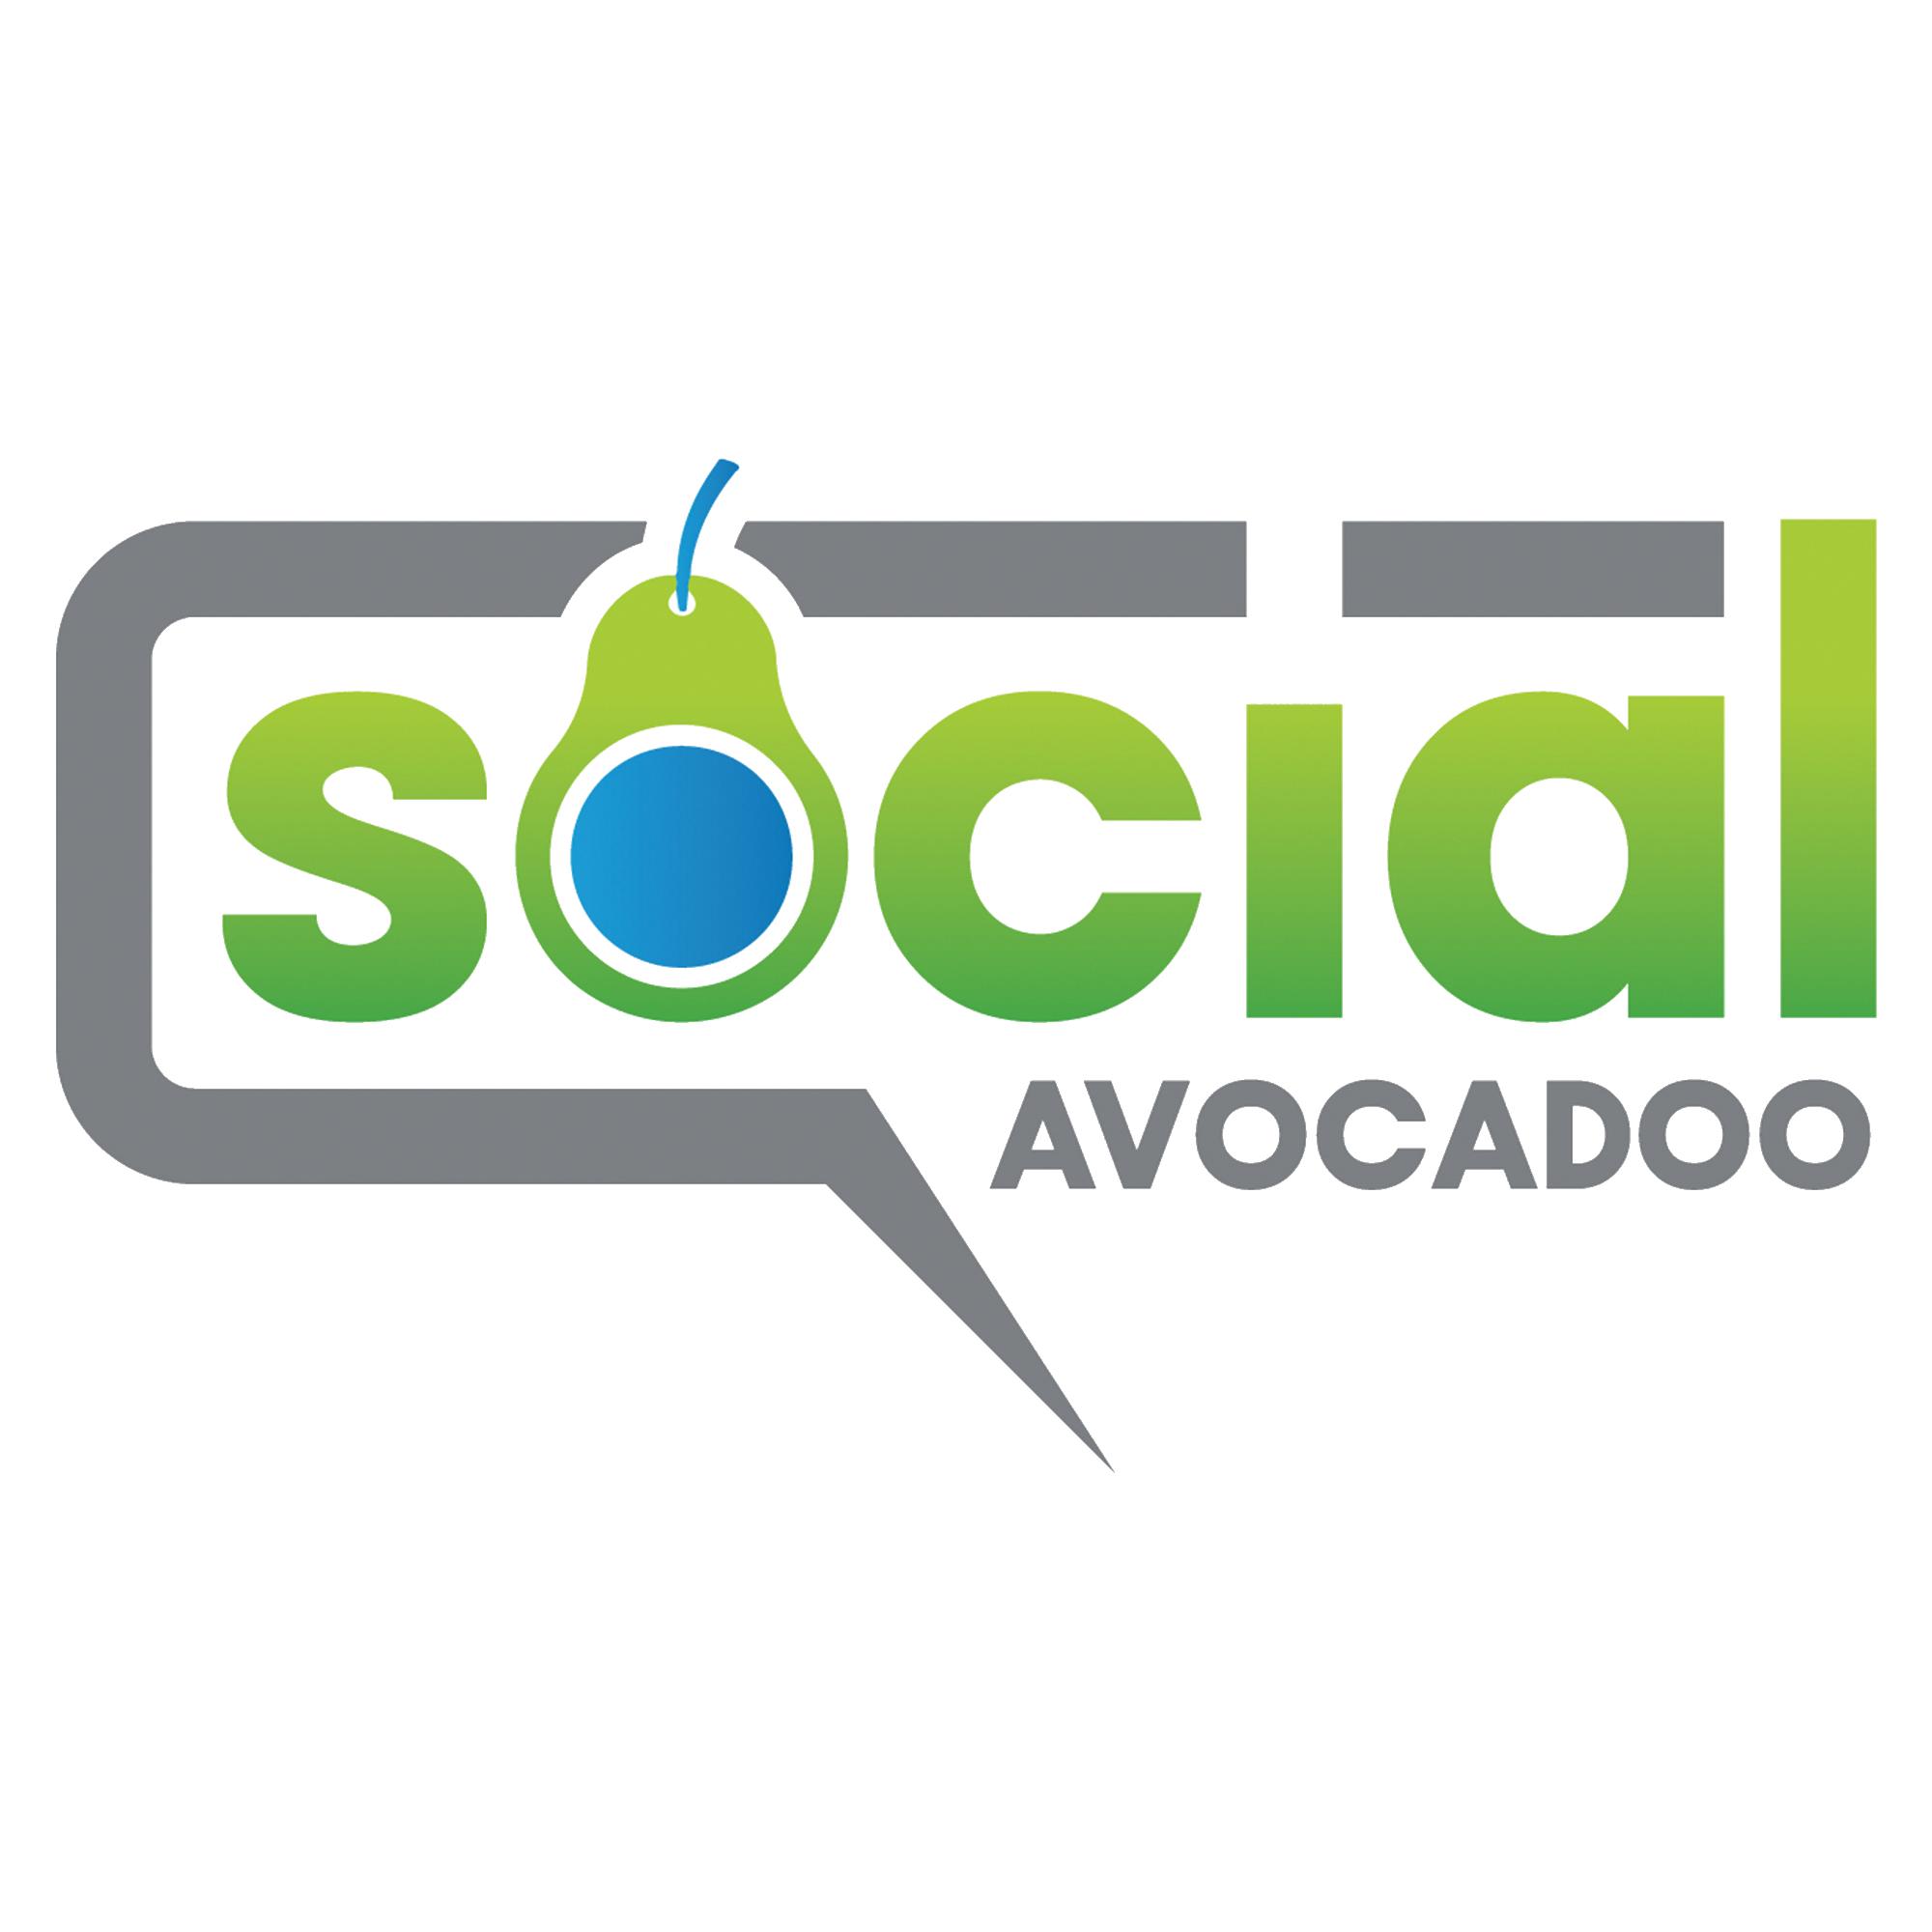 Social Avocadoo